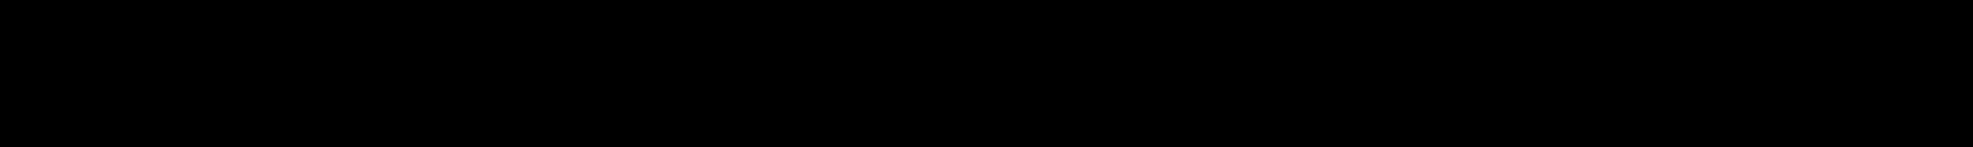 tlc logo